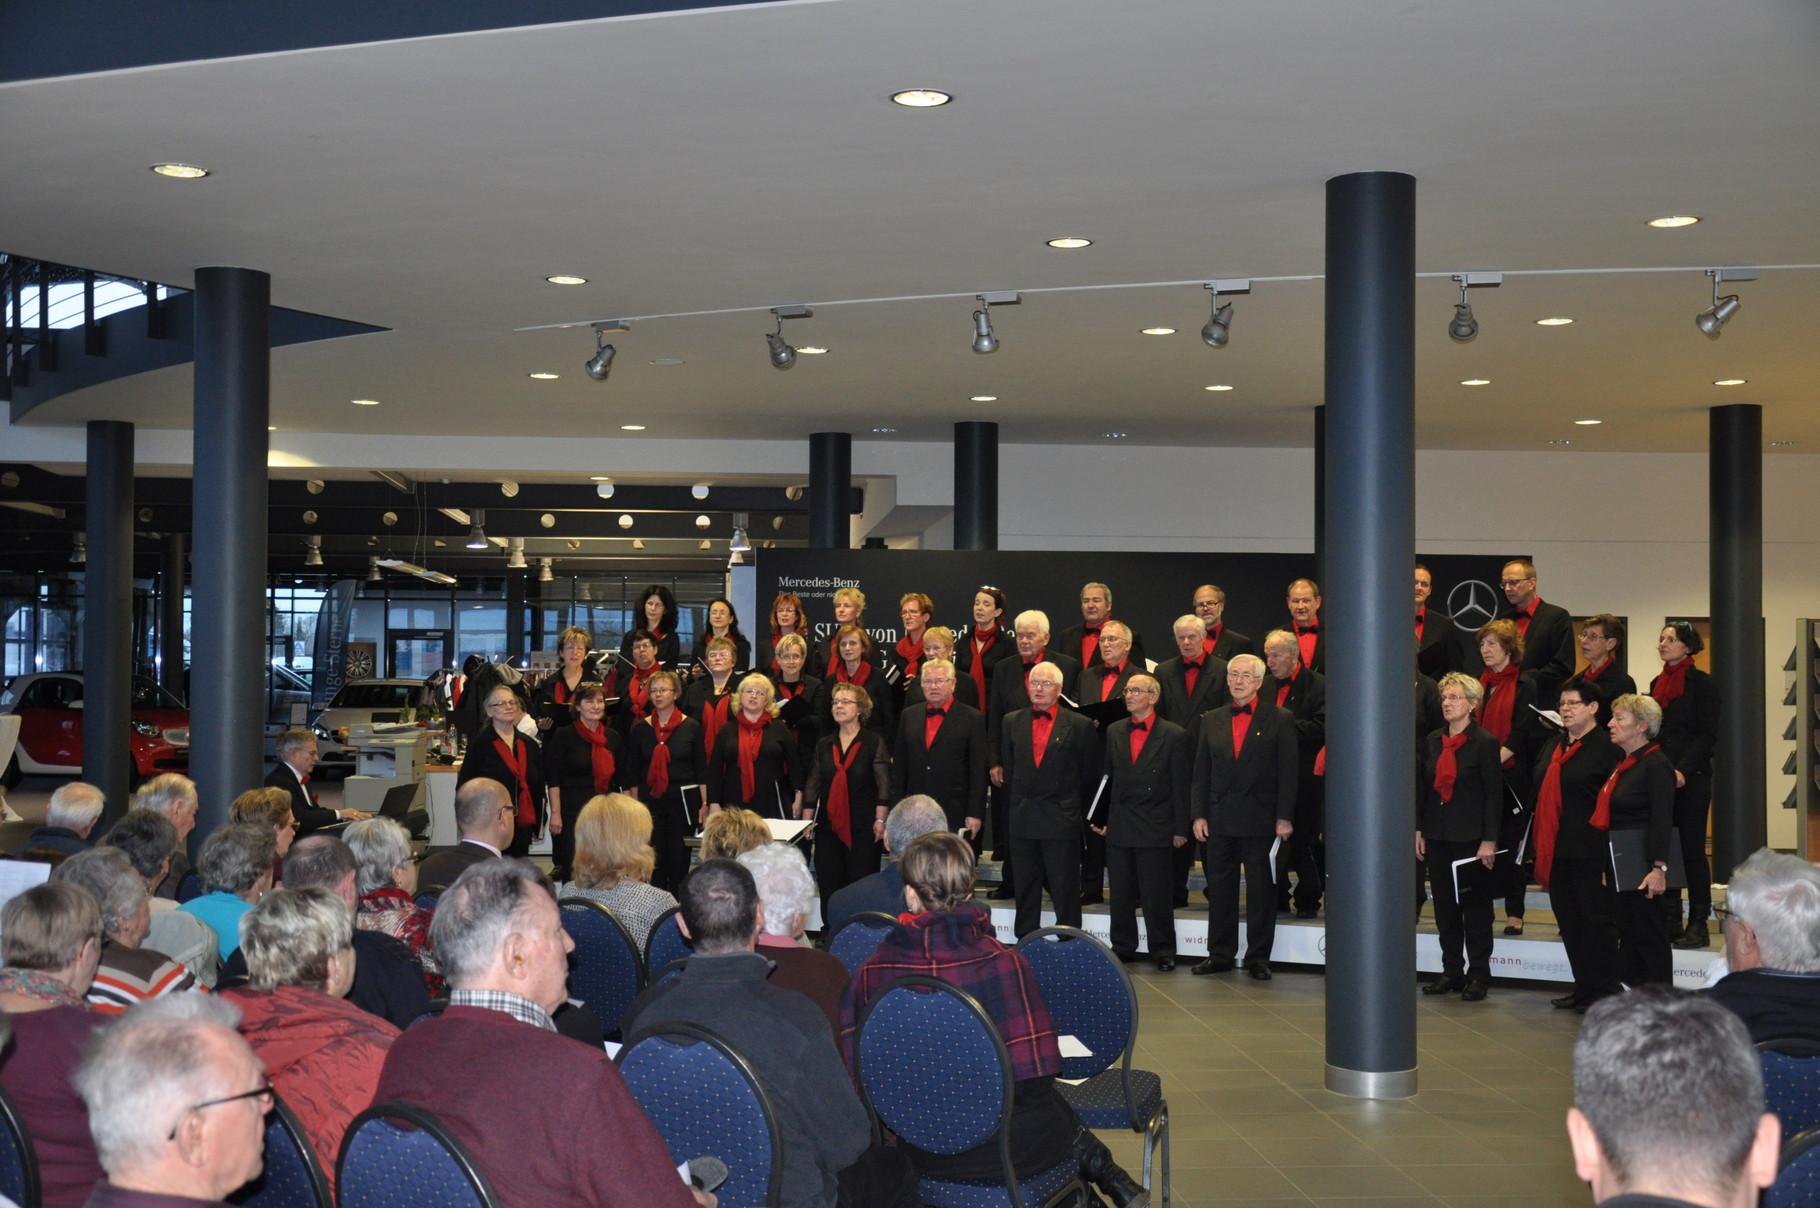 Adventskonzert im Autohaus Widmann 2015